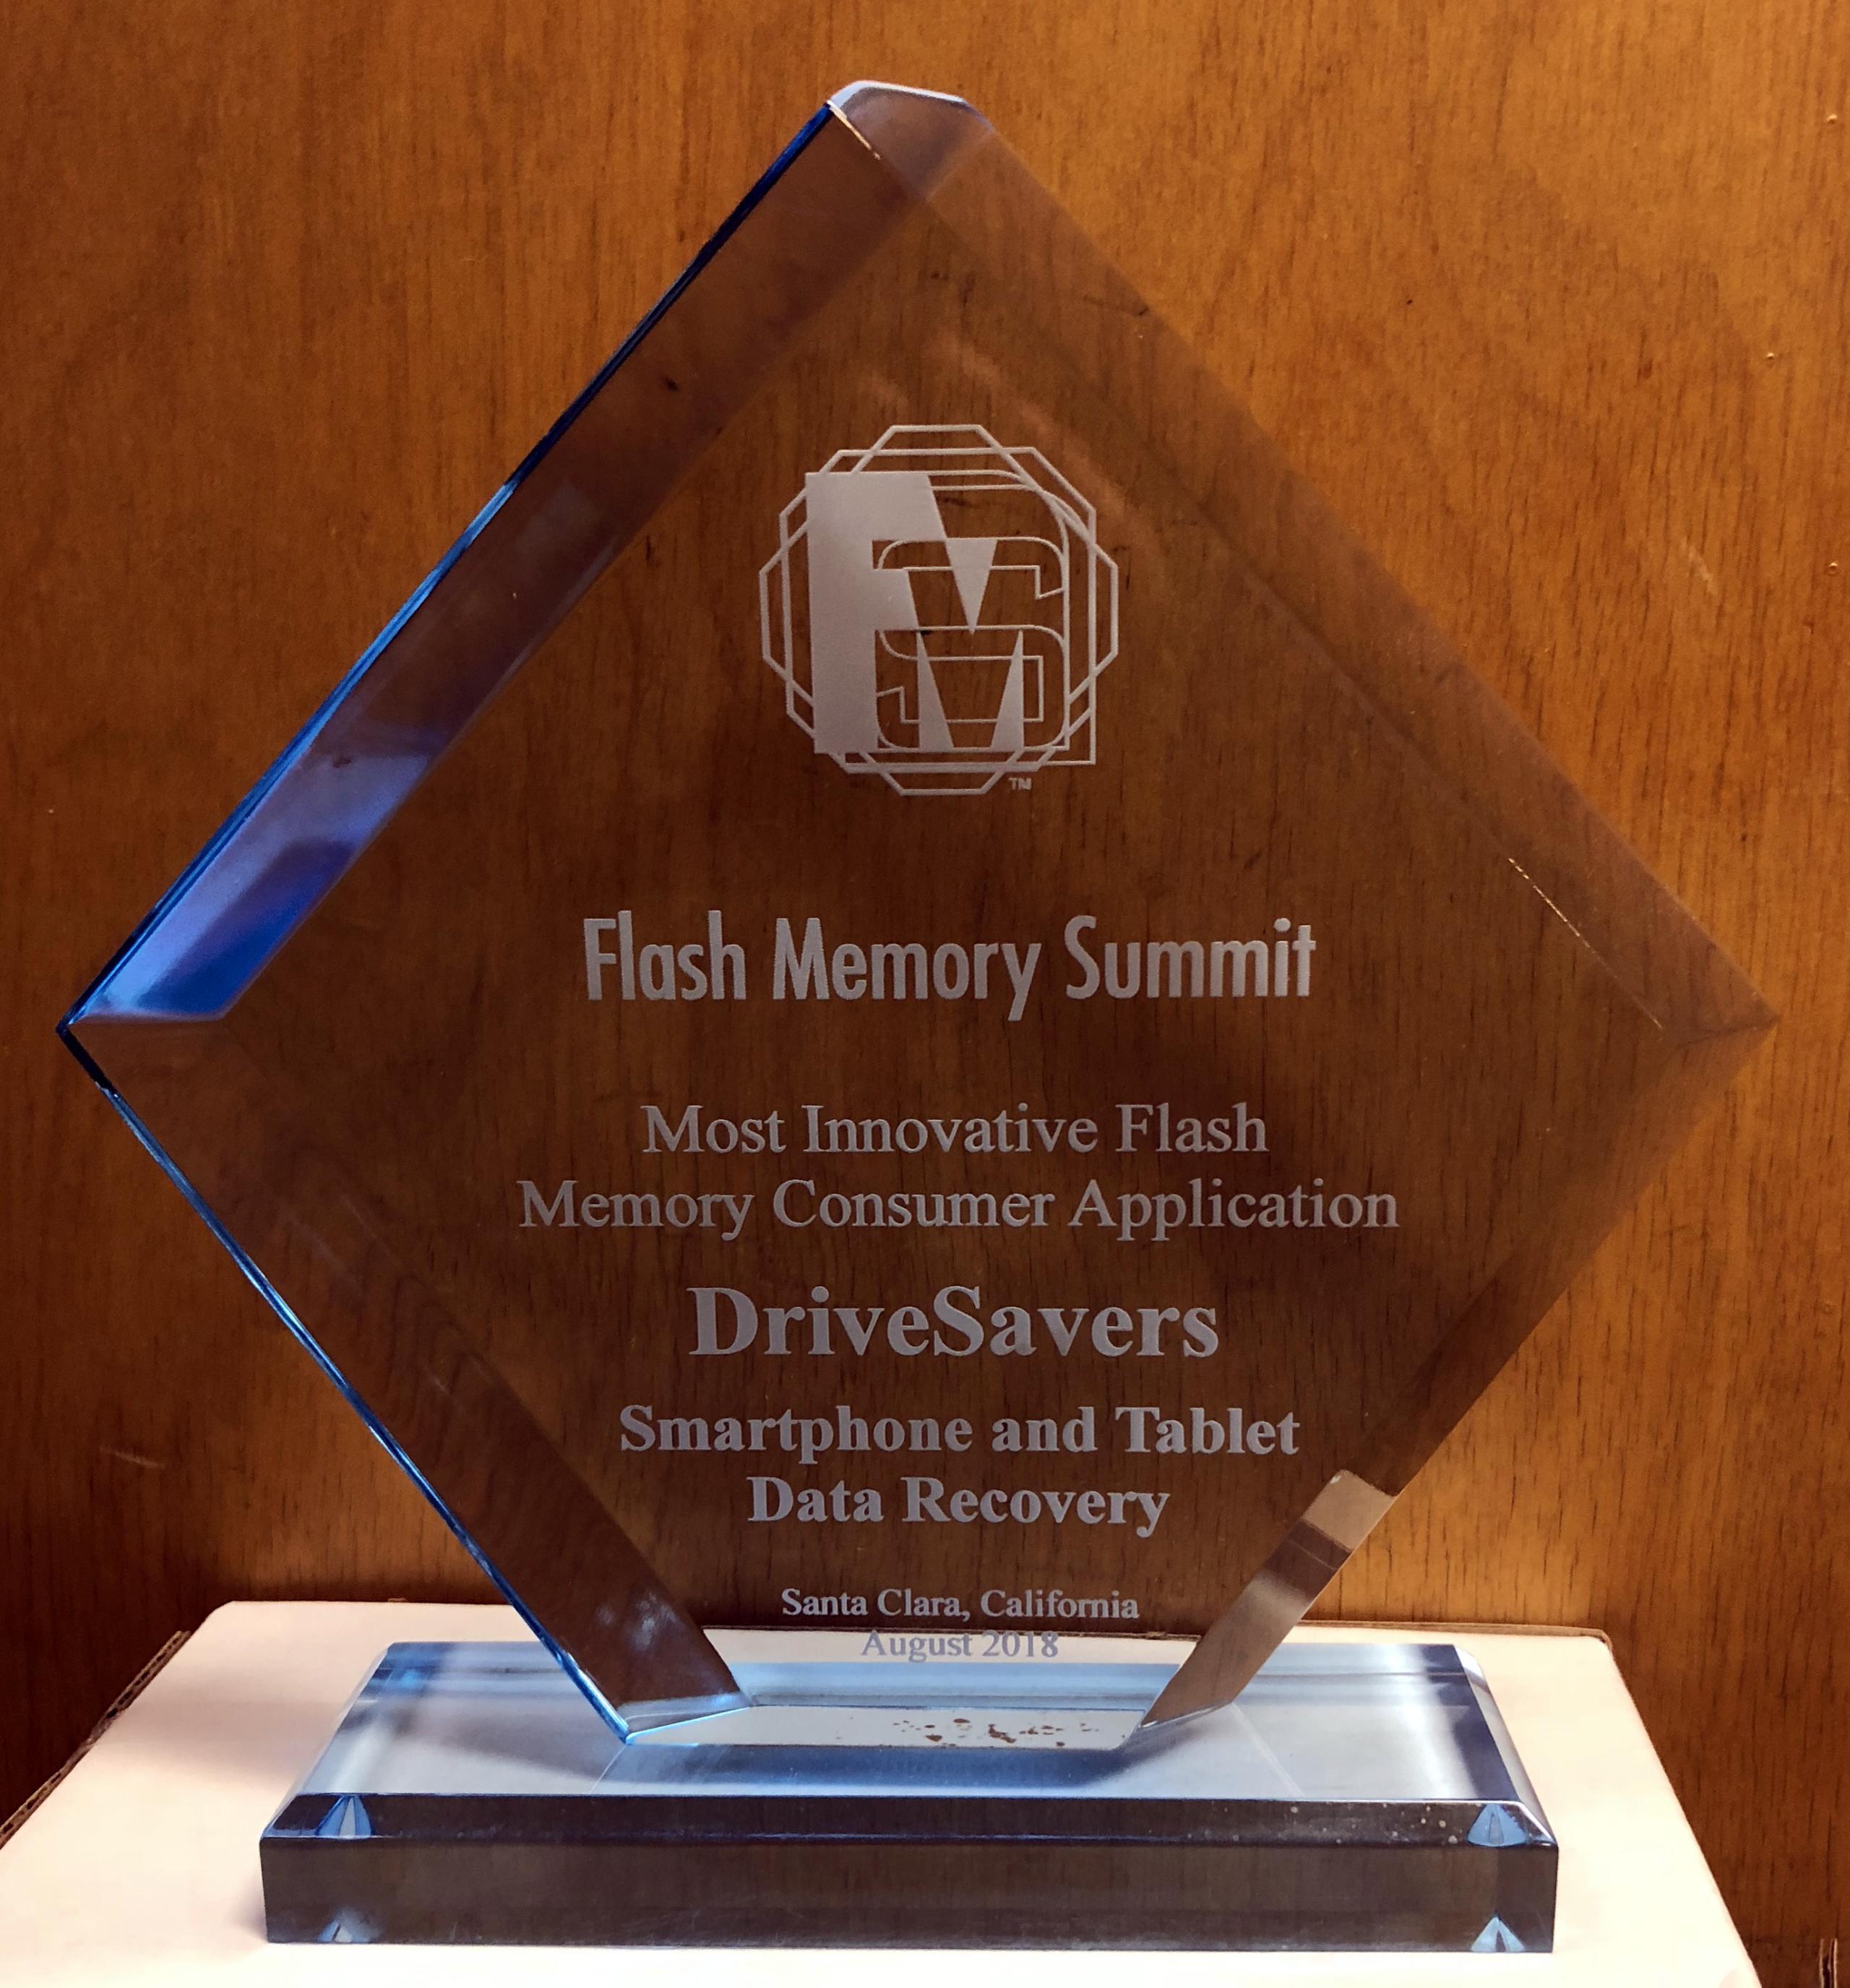 DriveSavers Wins 2018 Most Innovative Flash Memory Consumer Application Award